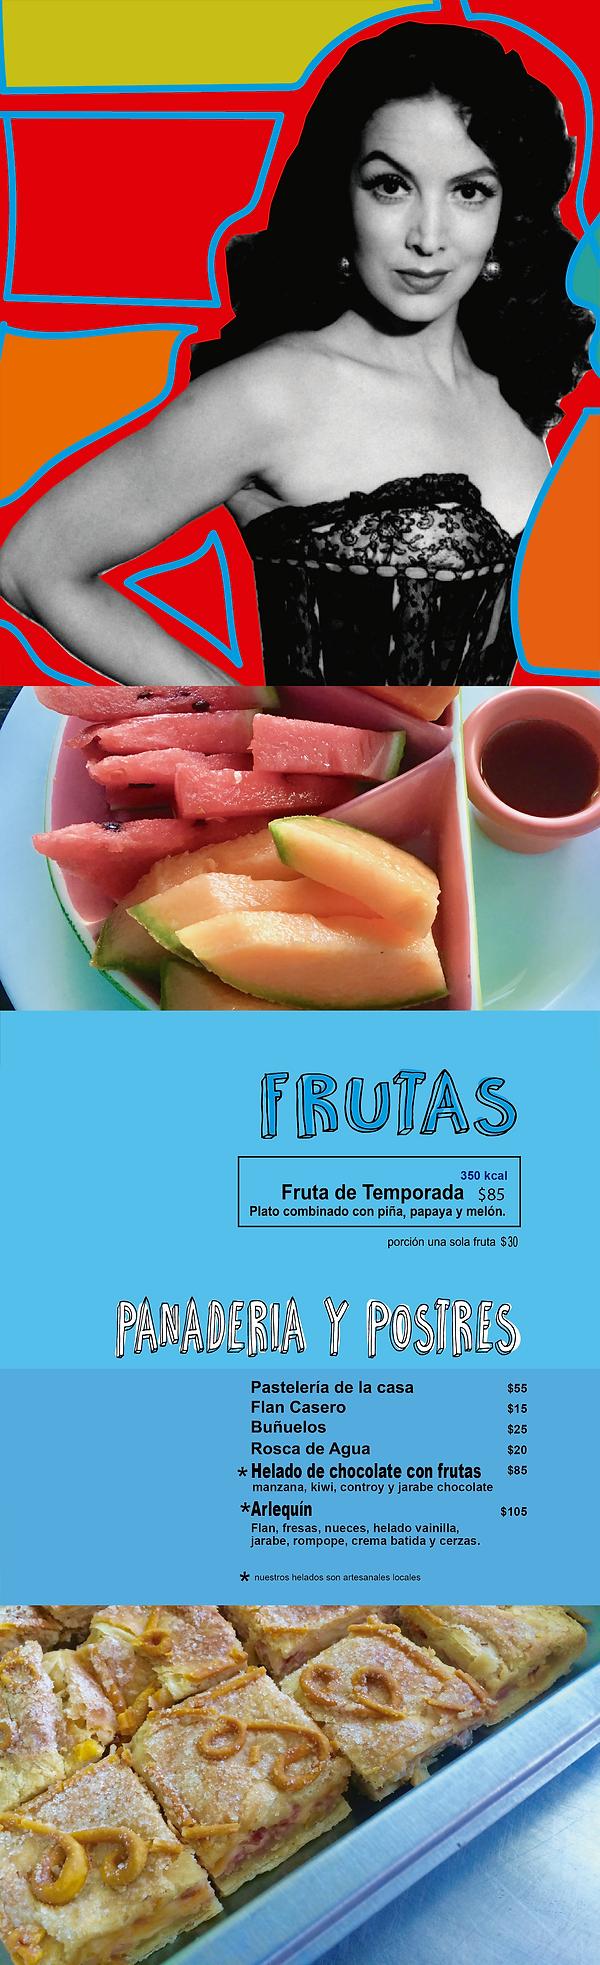 menu chchibas frutas 2021-01-01.png